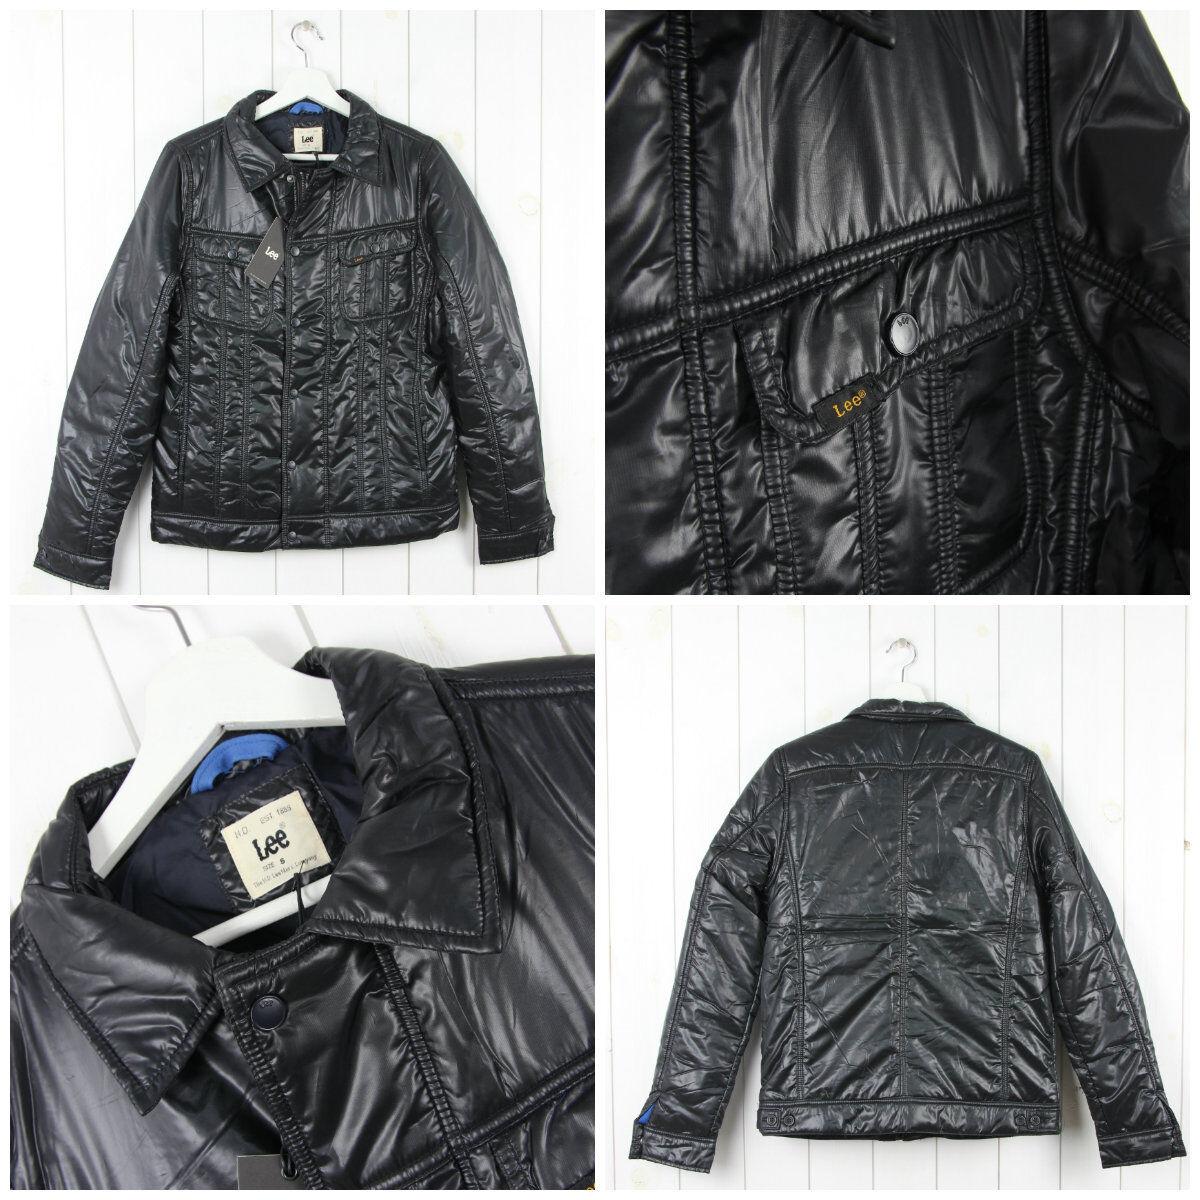 Neuf LEE nylon Rider veste denim style matelassé black 101 fin unique S M L